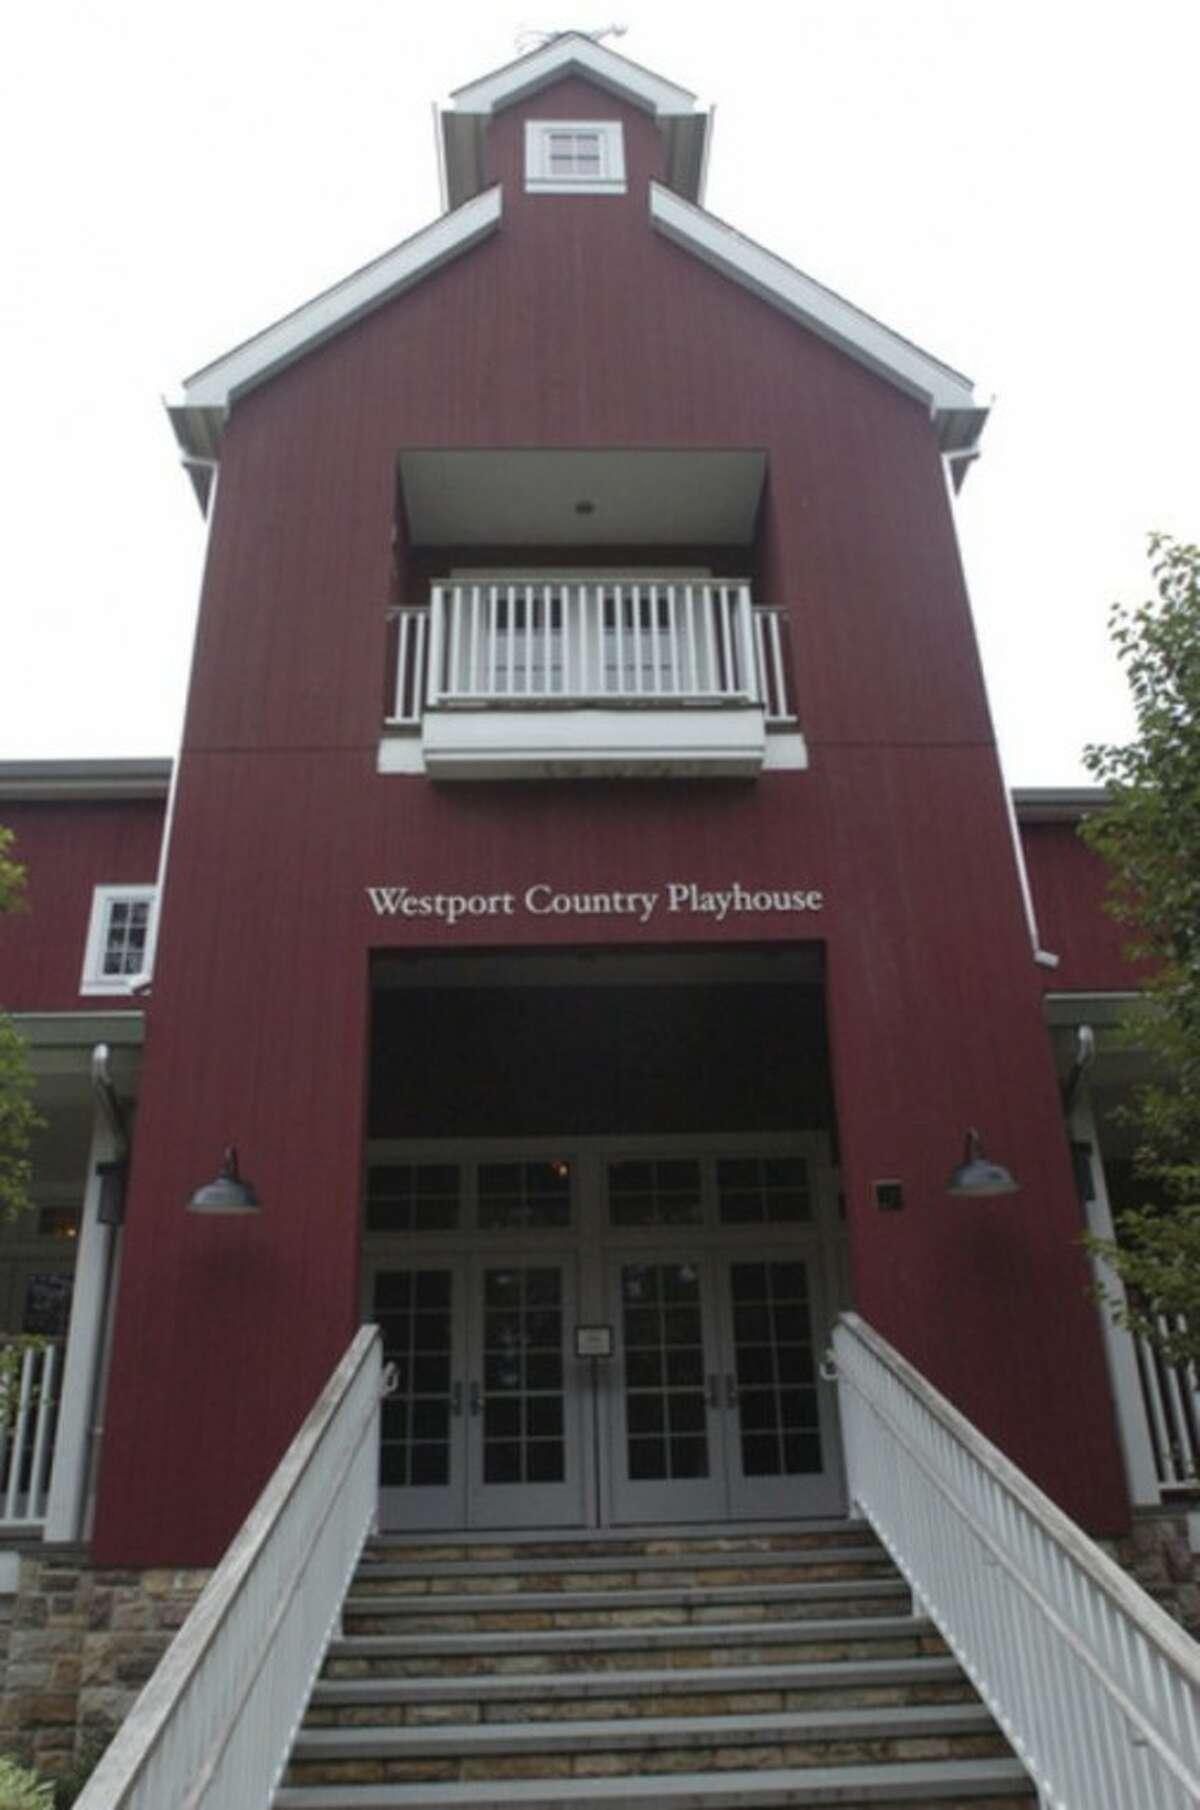 Hour photo / Matthew Vinci Westport Country Playhouse